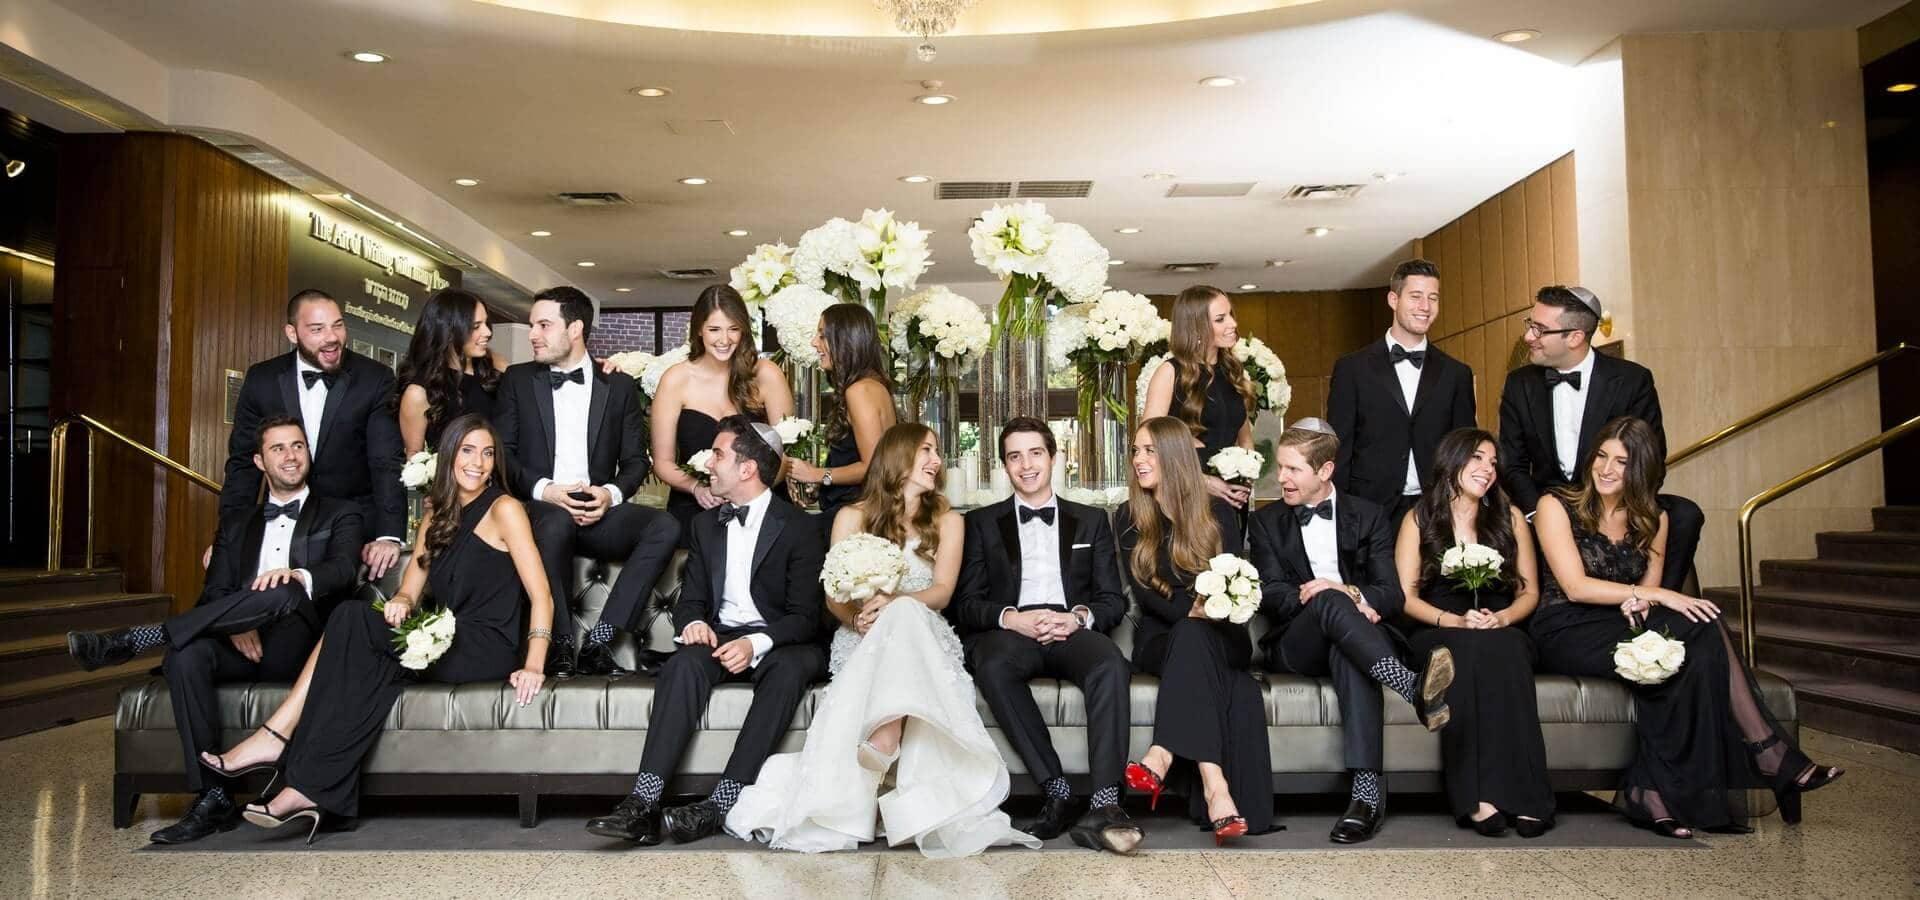 Hero image for Madison and Josh's Stunning Wedding at Adath Israel Synagogue